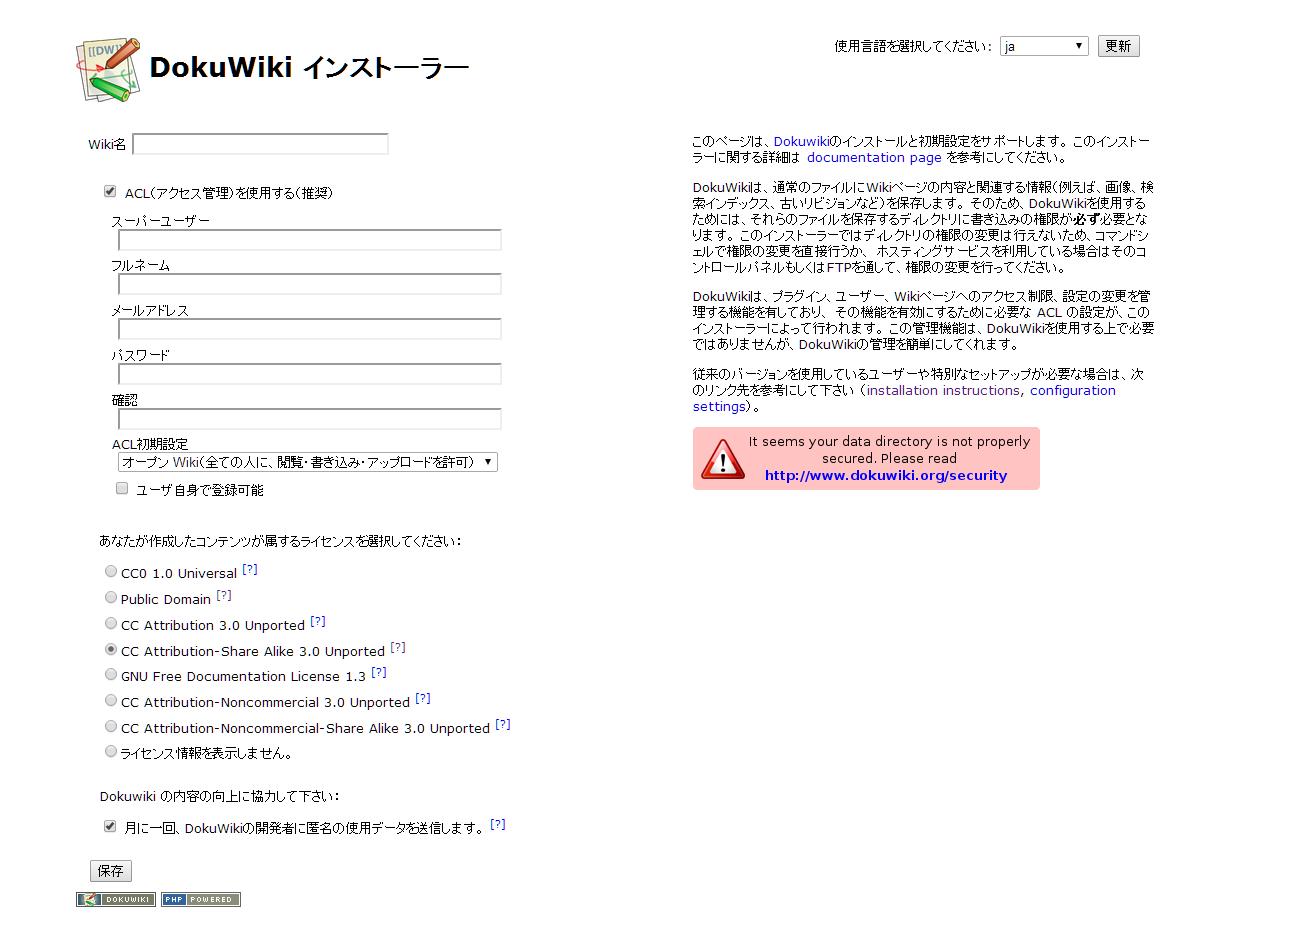 DokuWiki Installer_ja.png